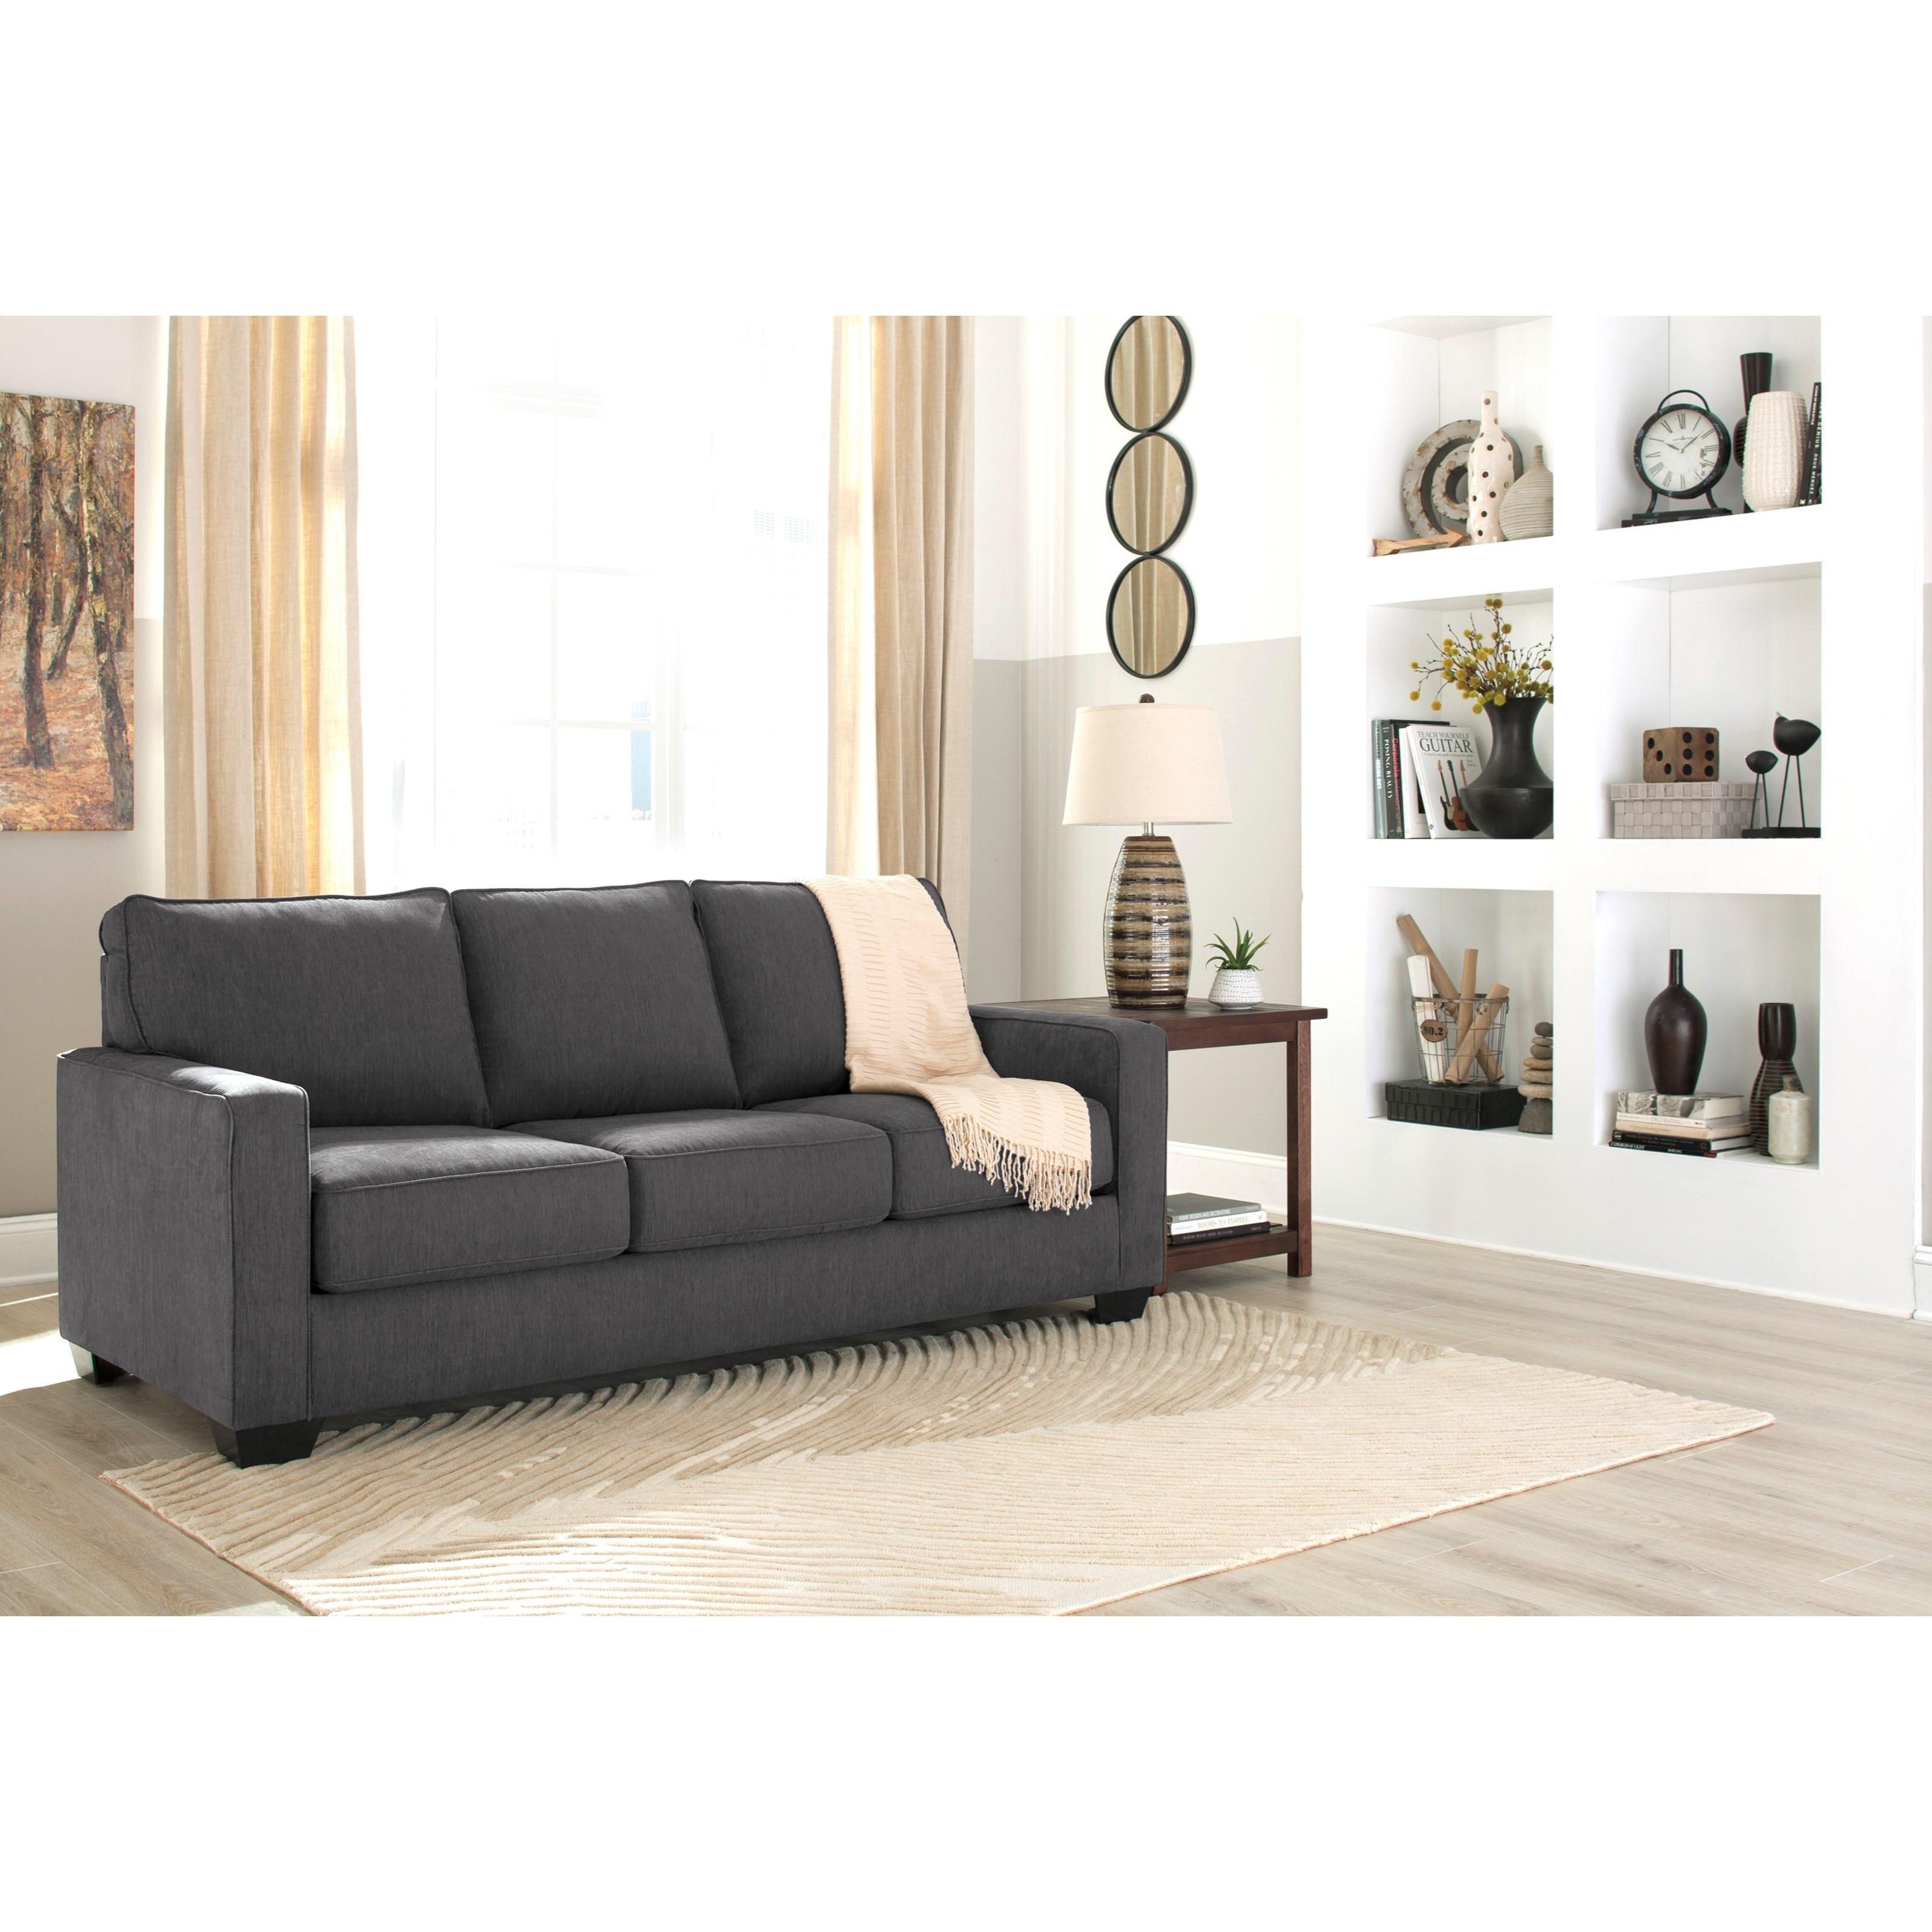 foam sofa sleeper stanton sofas portland oregon queen with memory mattress by signature design